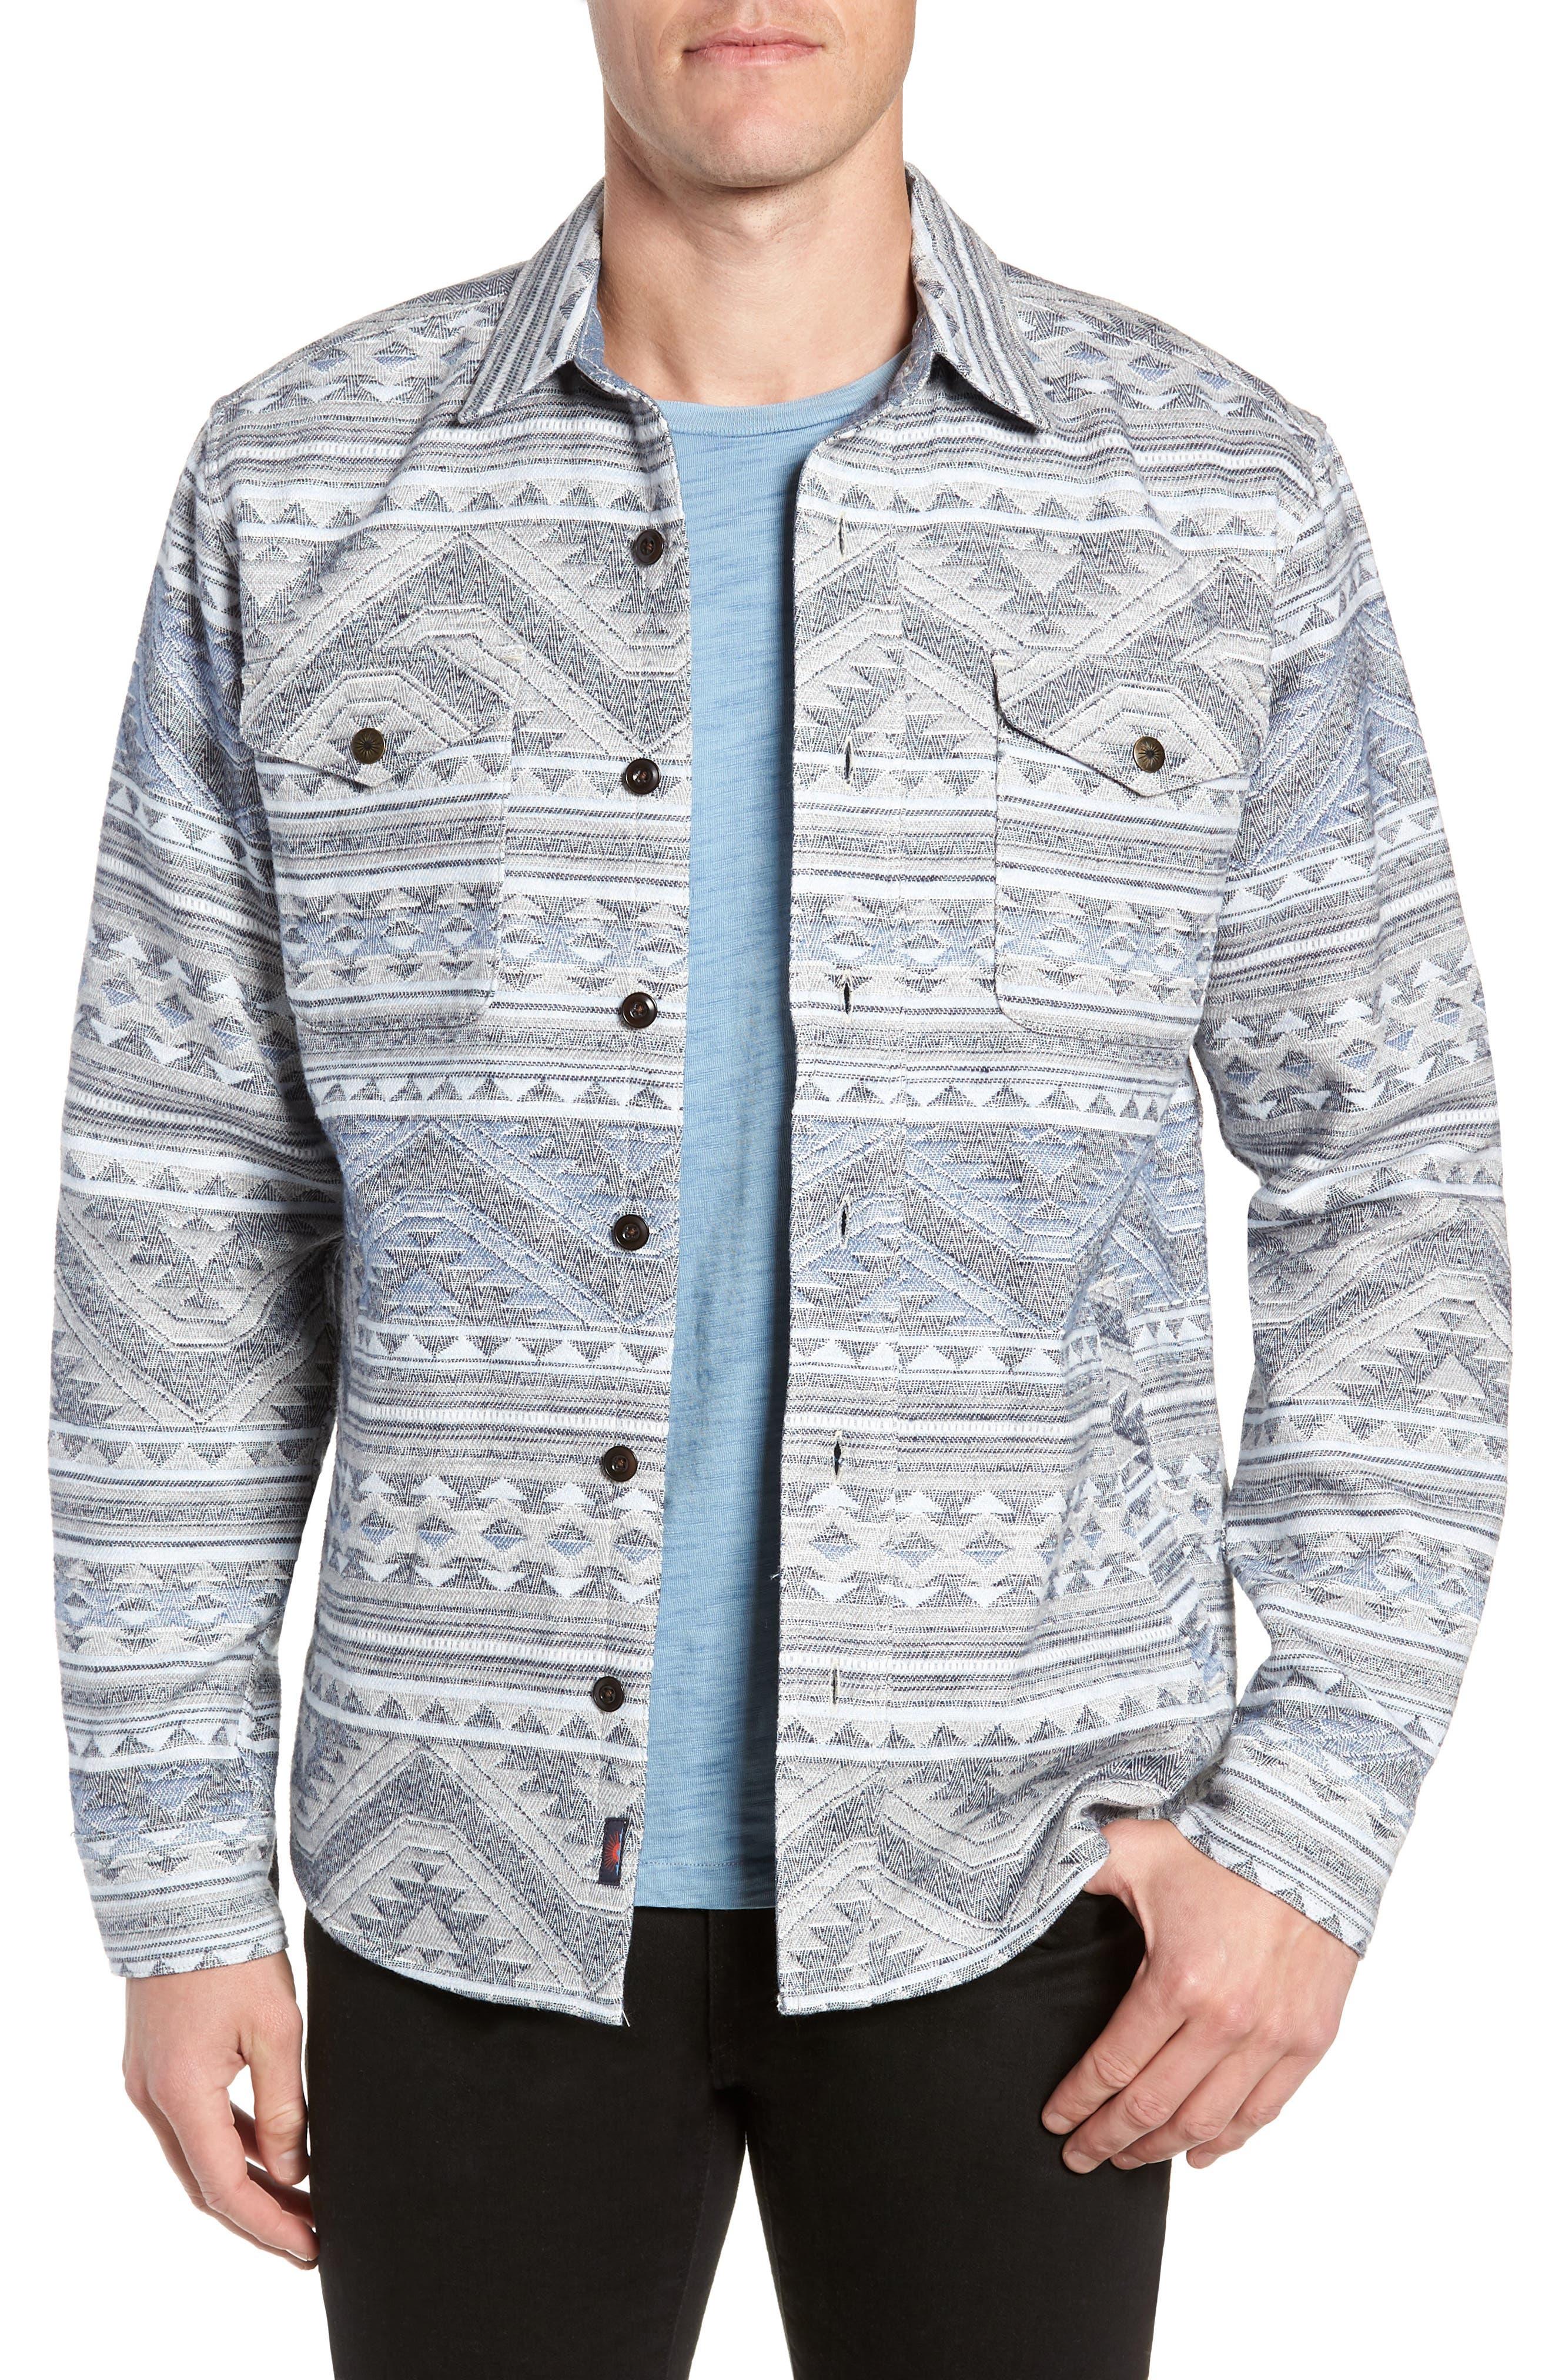 Durango CPO Cotton Work Shirt,                             Main thumbnail 1, color,                             TWILIGHT GLACIER